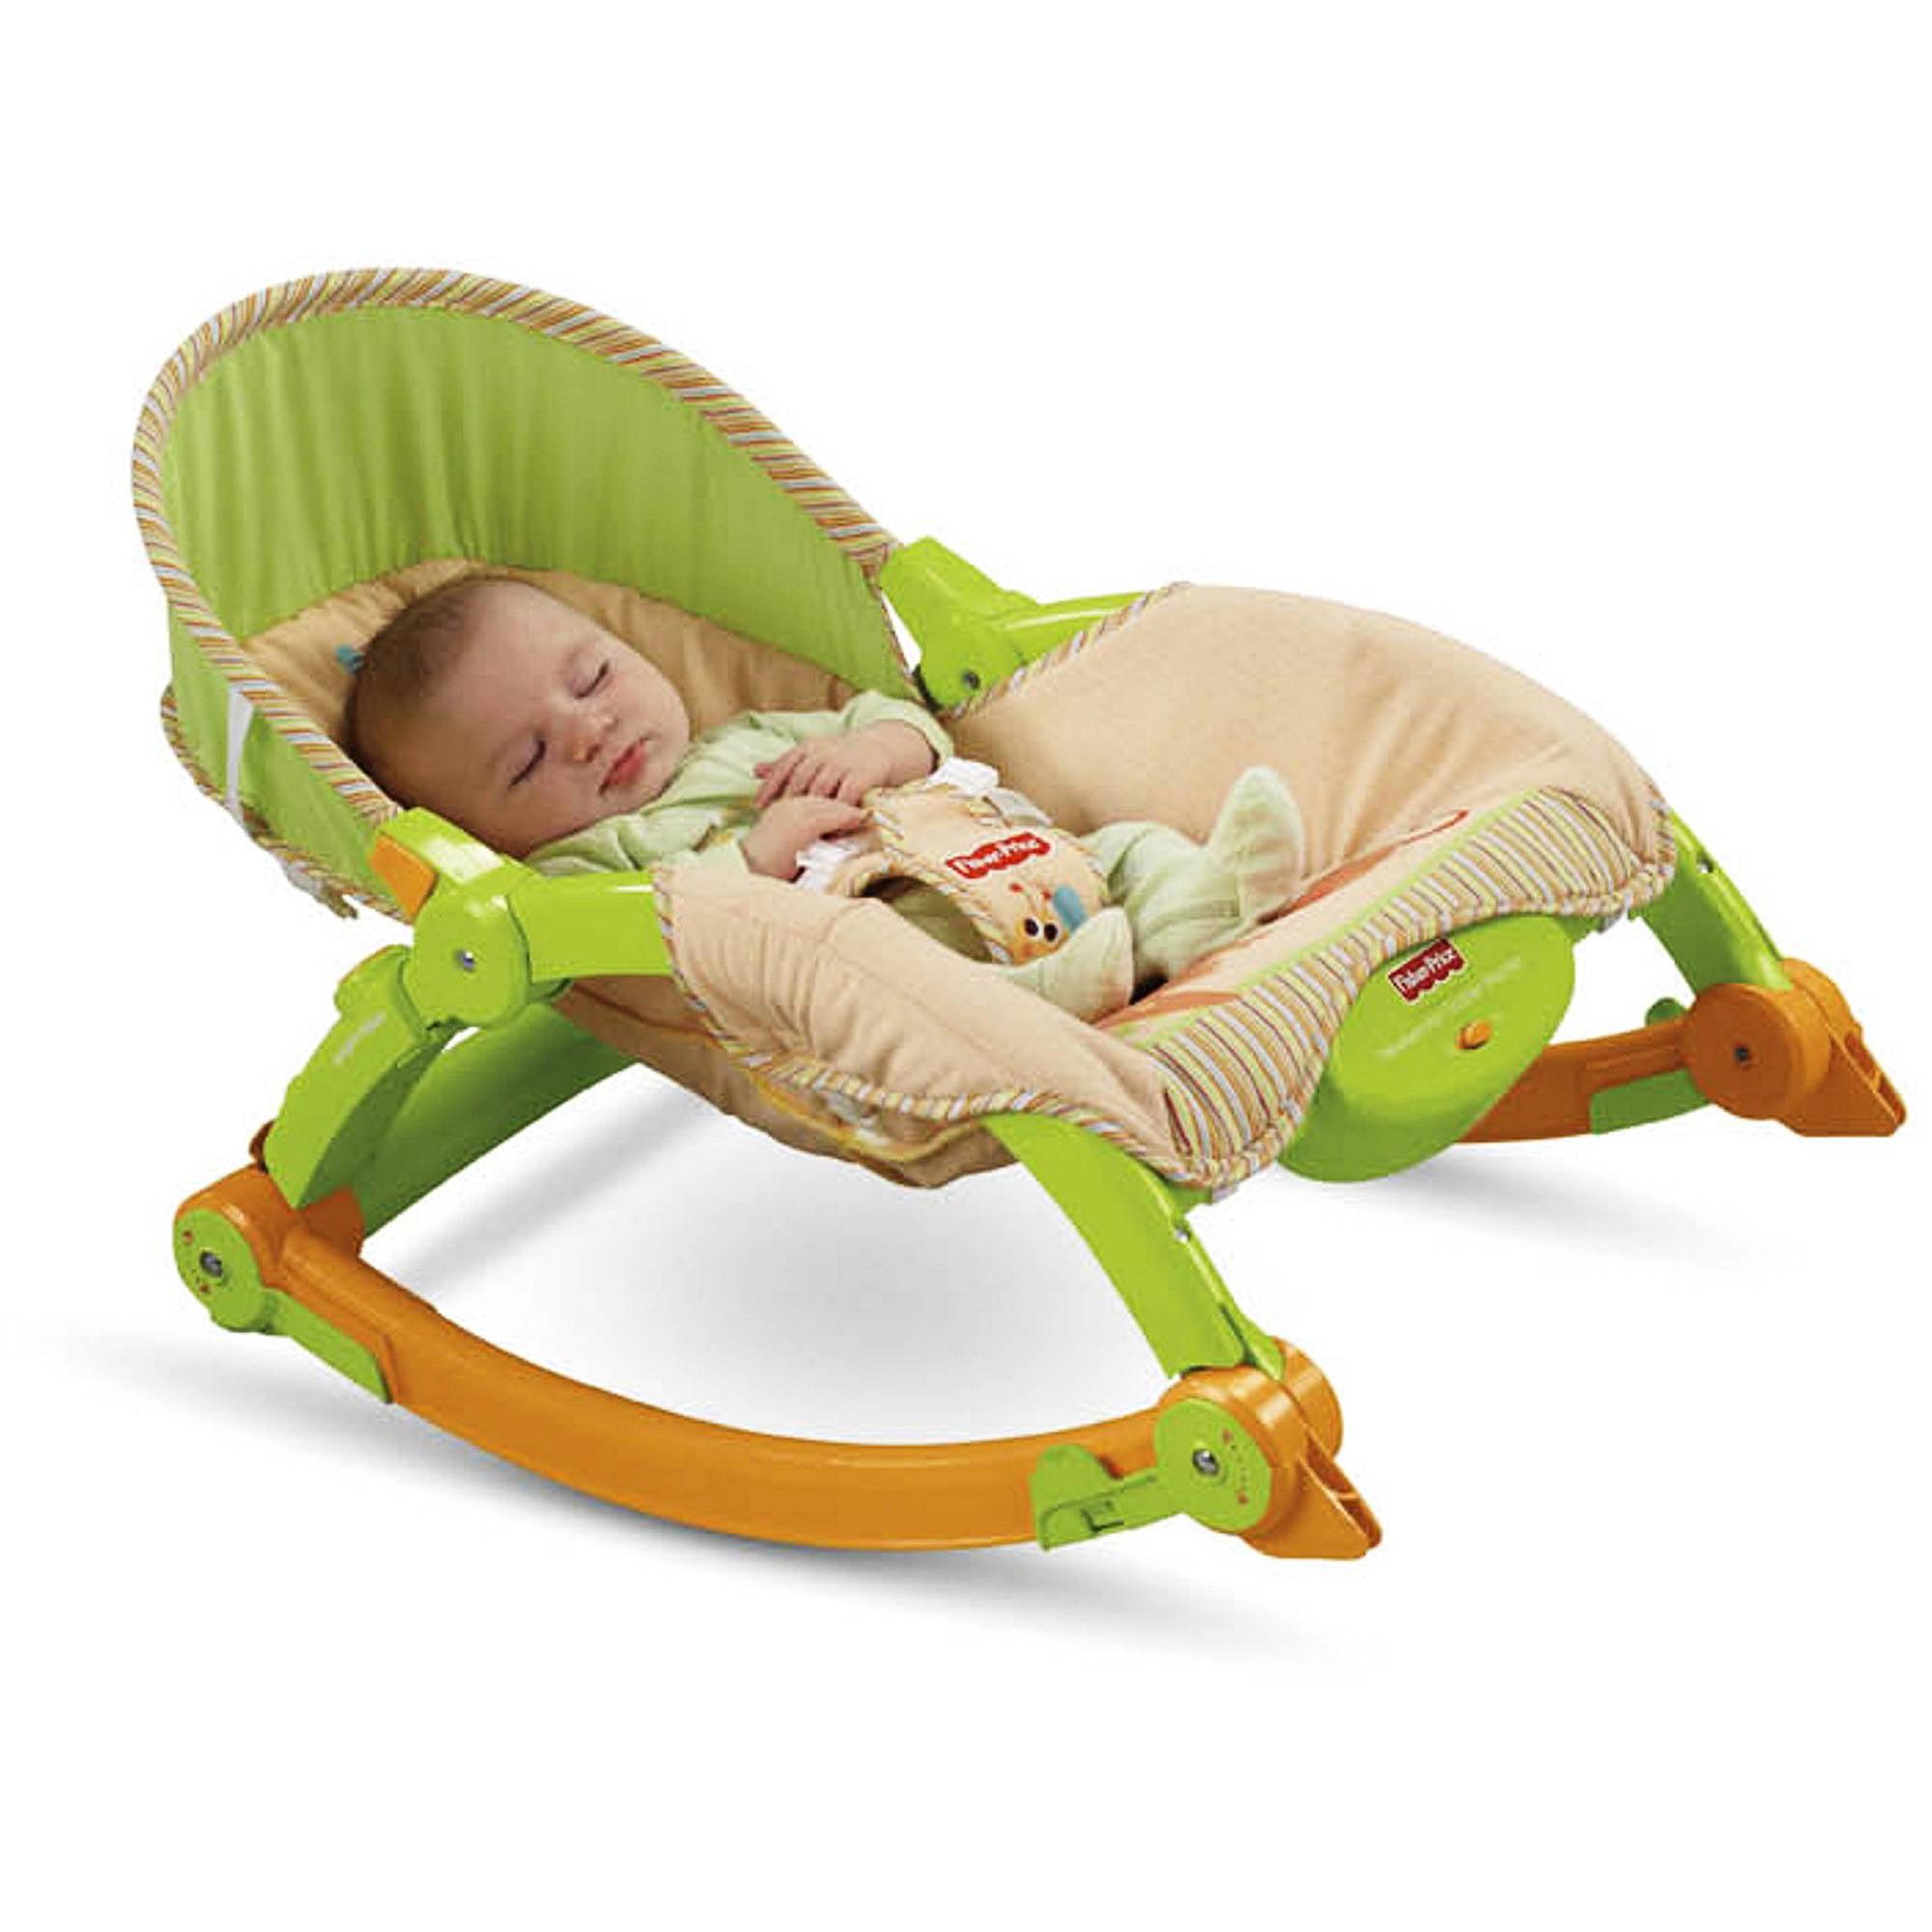 Fisher-Price - Newborn to Toddler Portable Rocker